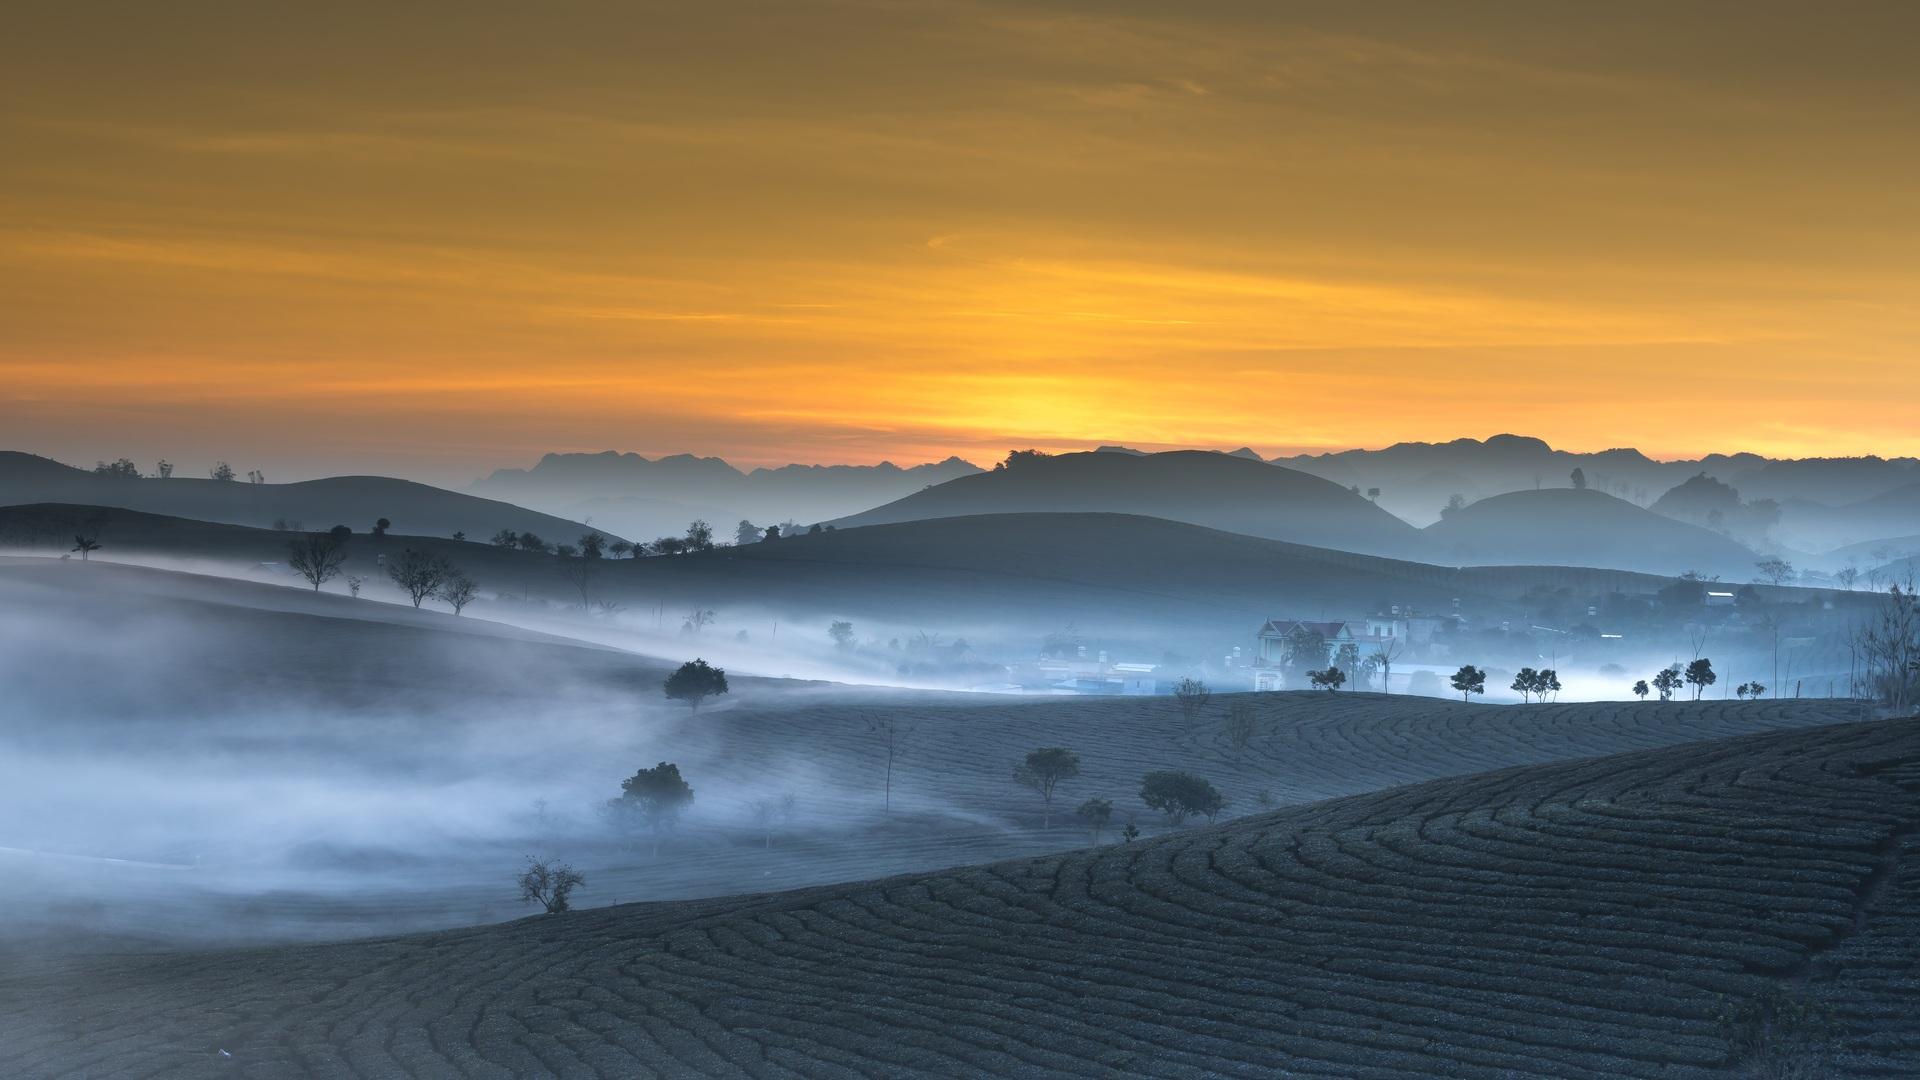 morning-in-the-farmyard-vp.jpg